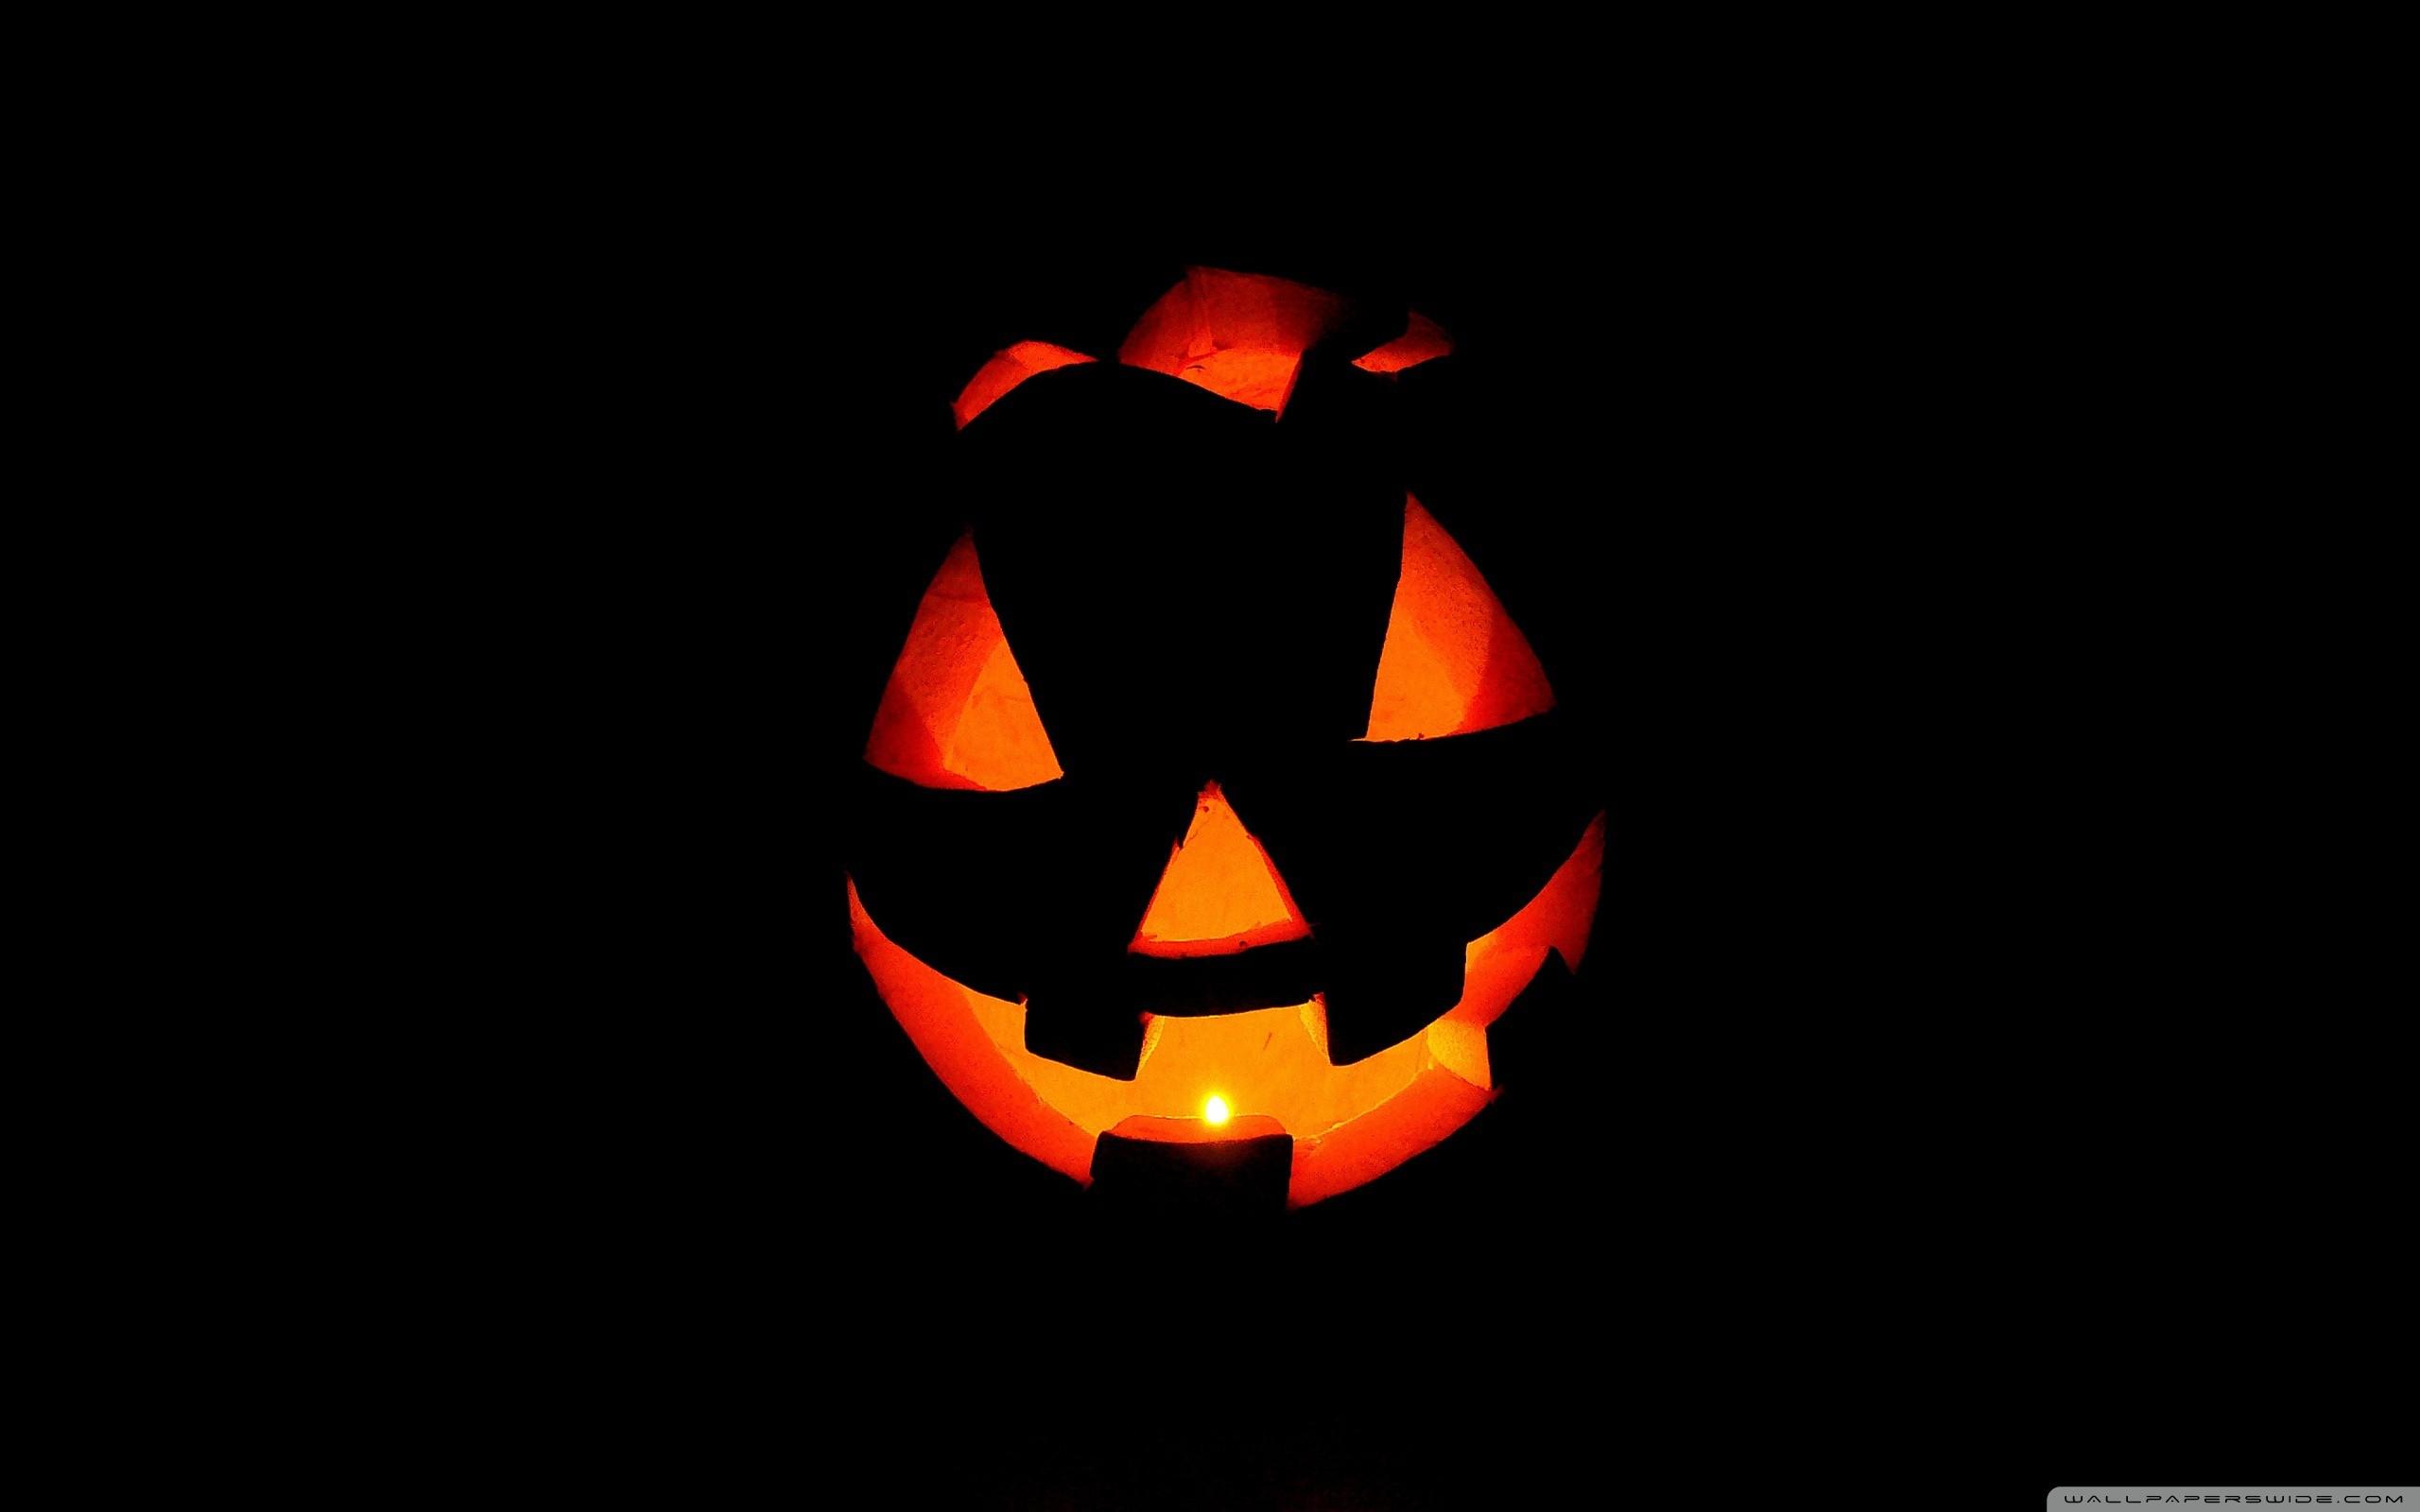 Wallpaper Halloween Scary Room Jack O Lantern Pumpkin Halloween